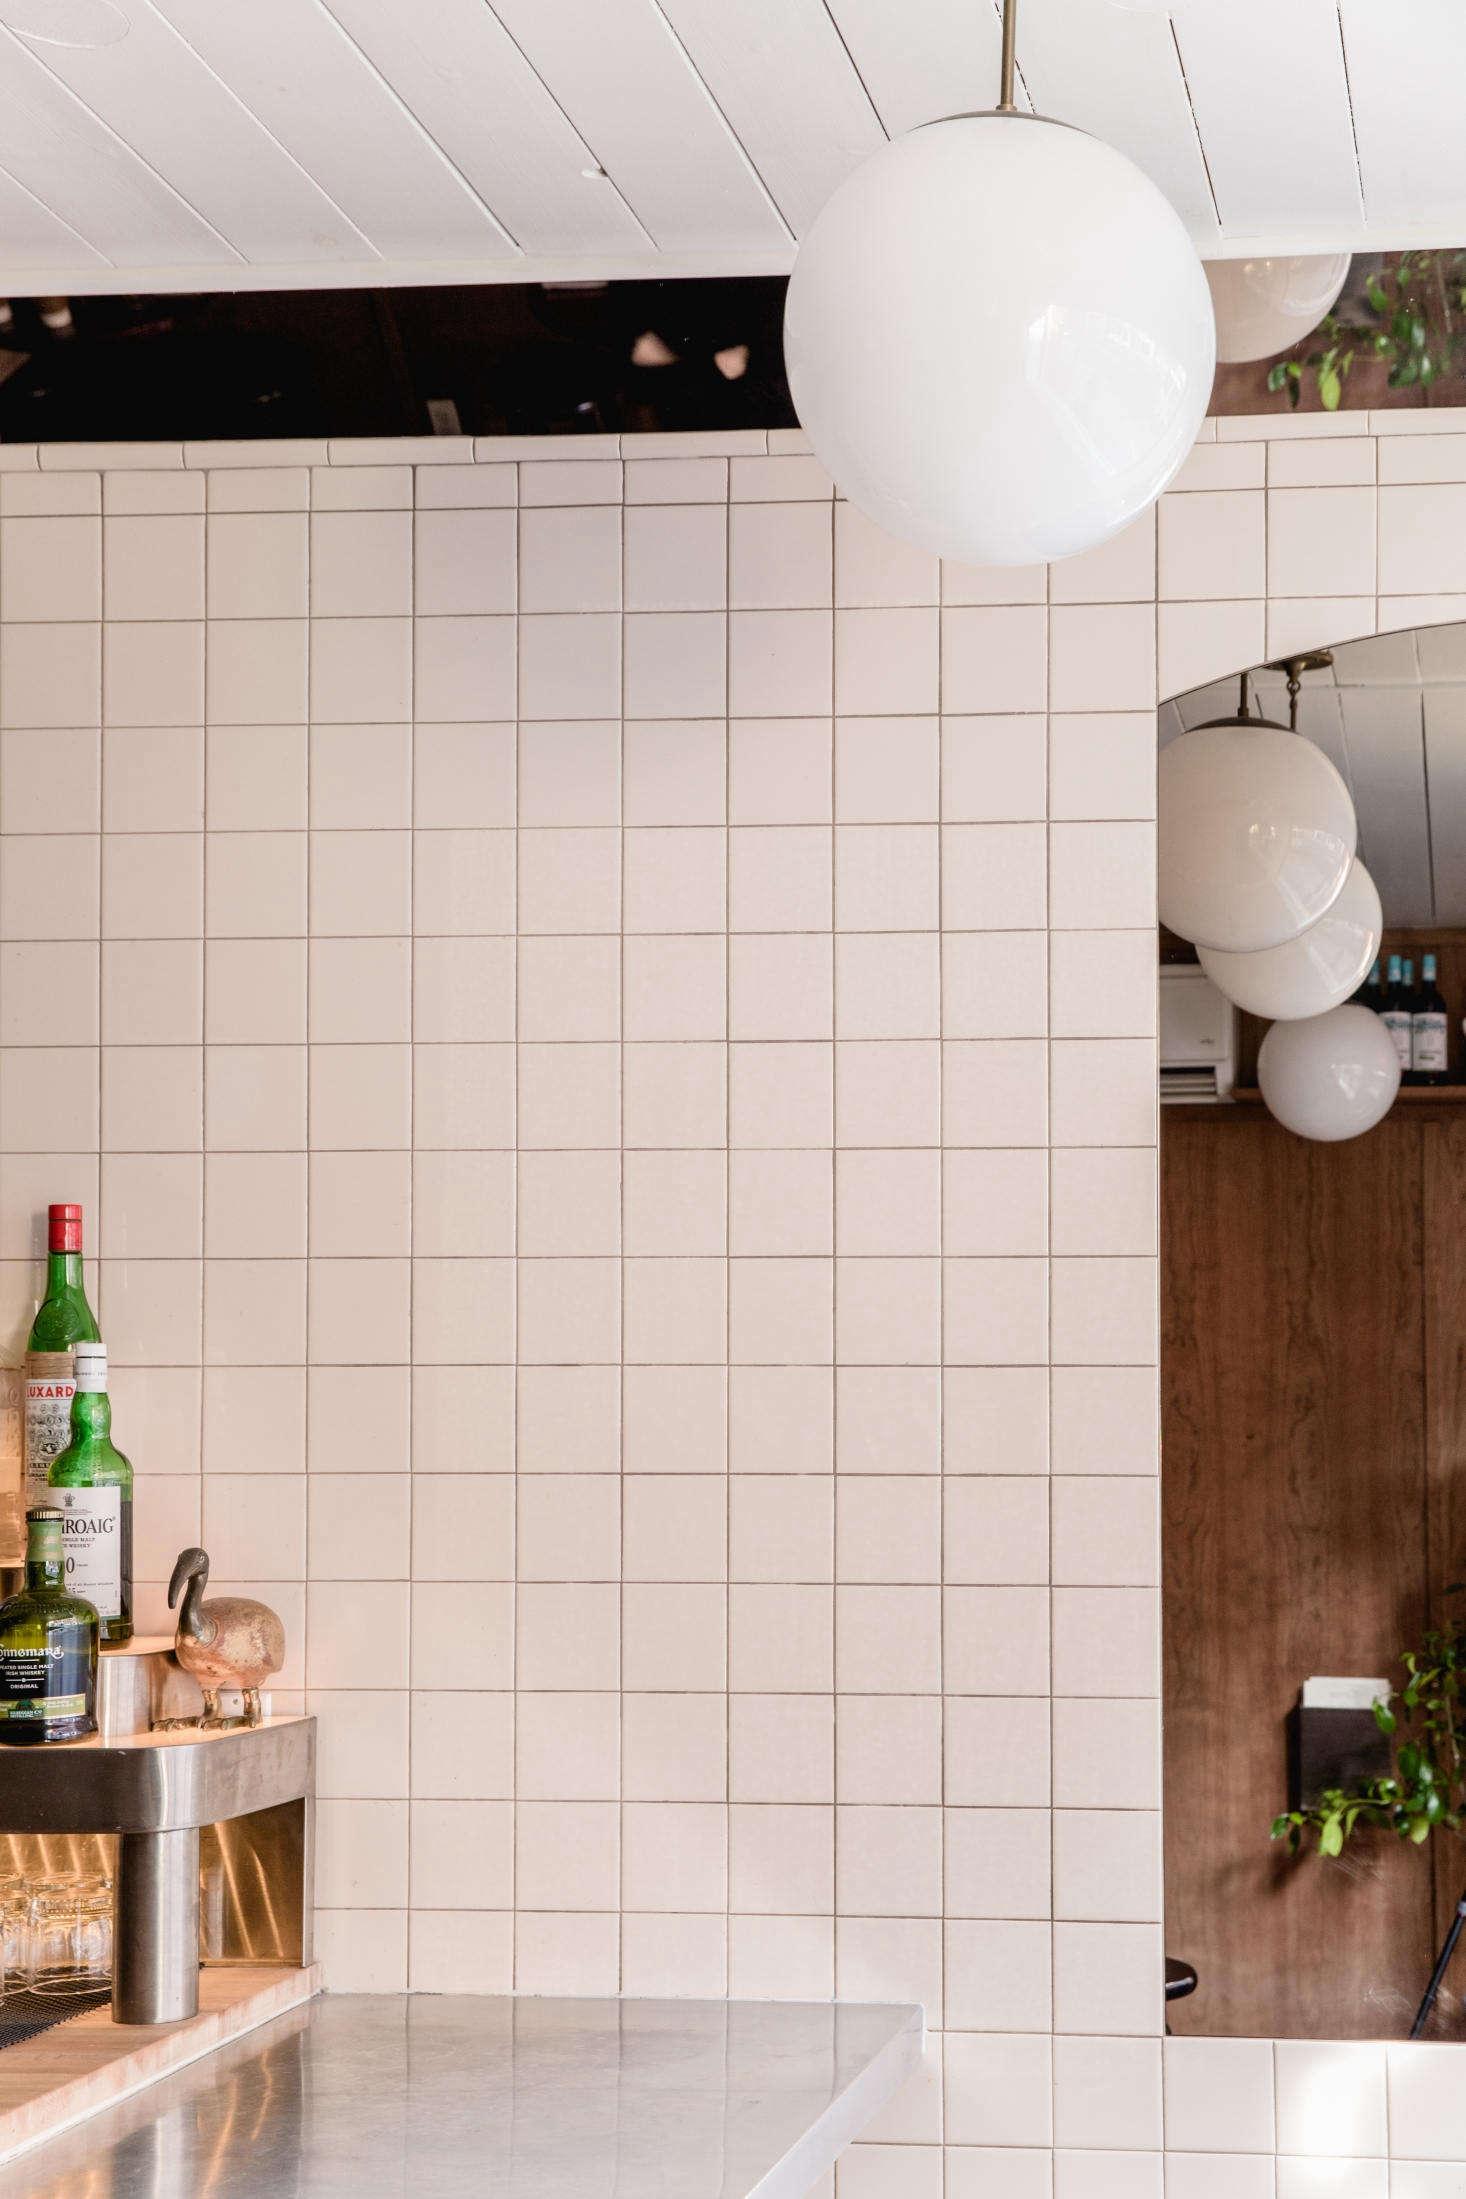 A long thin mirror runs above the bar, where the wall meets the ceiling. It&#8